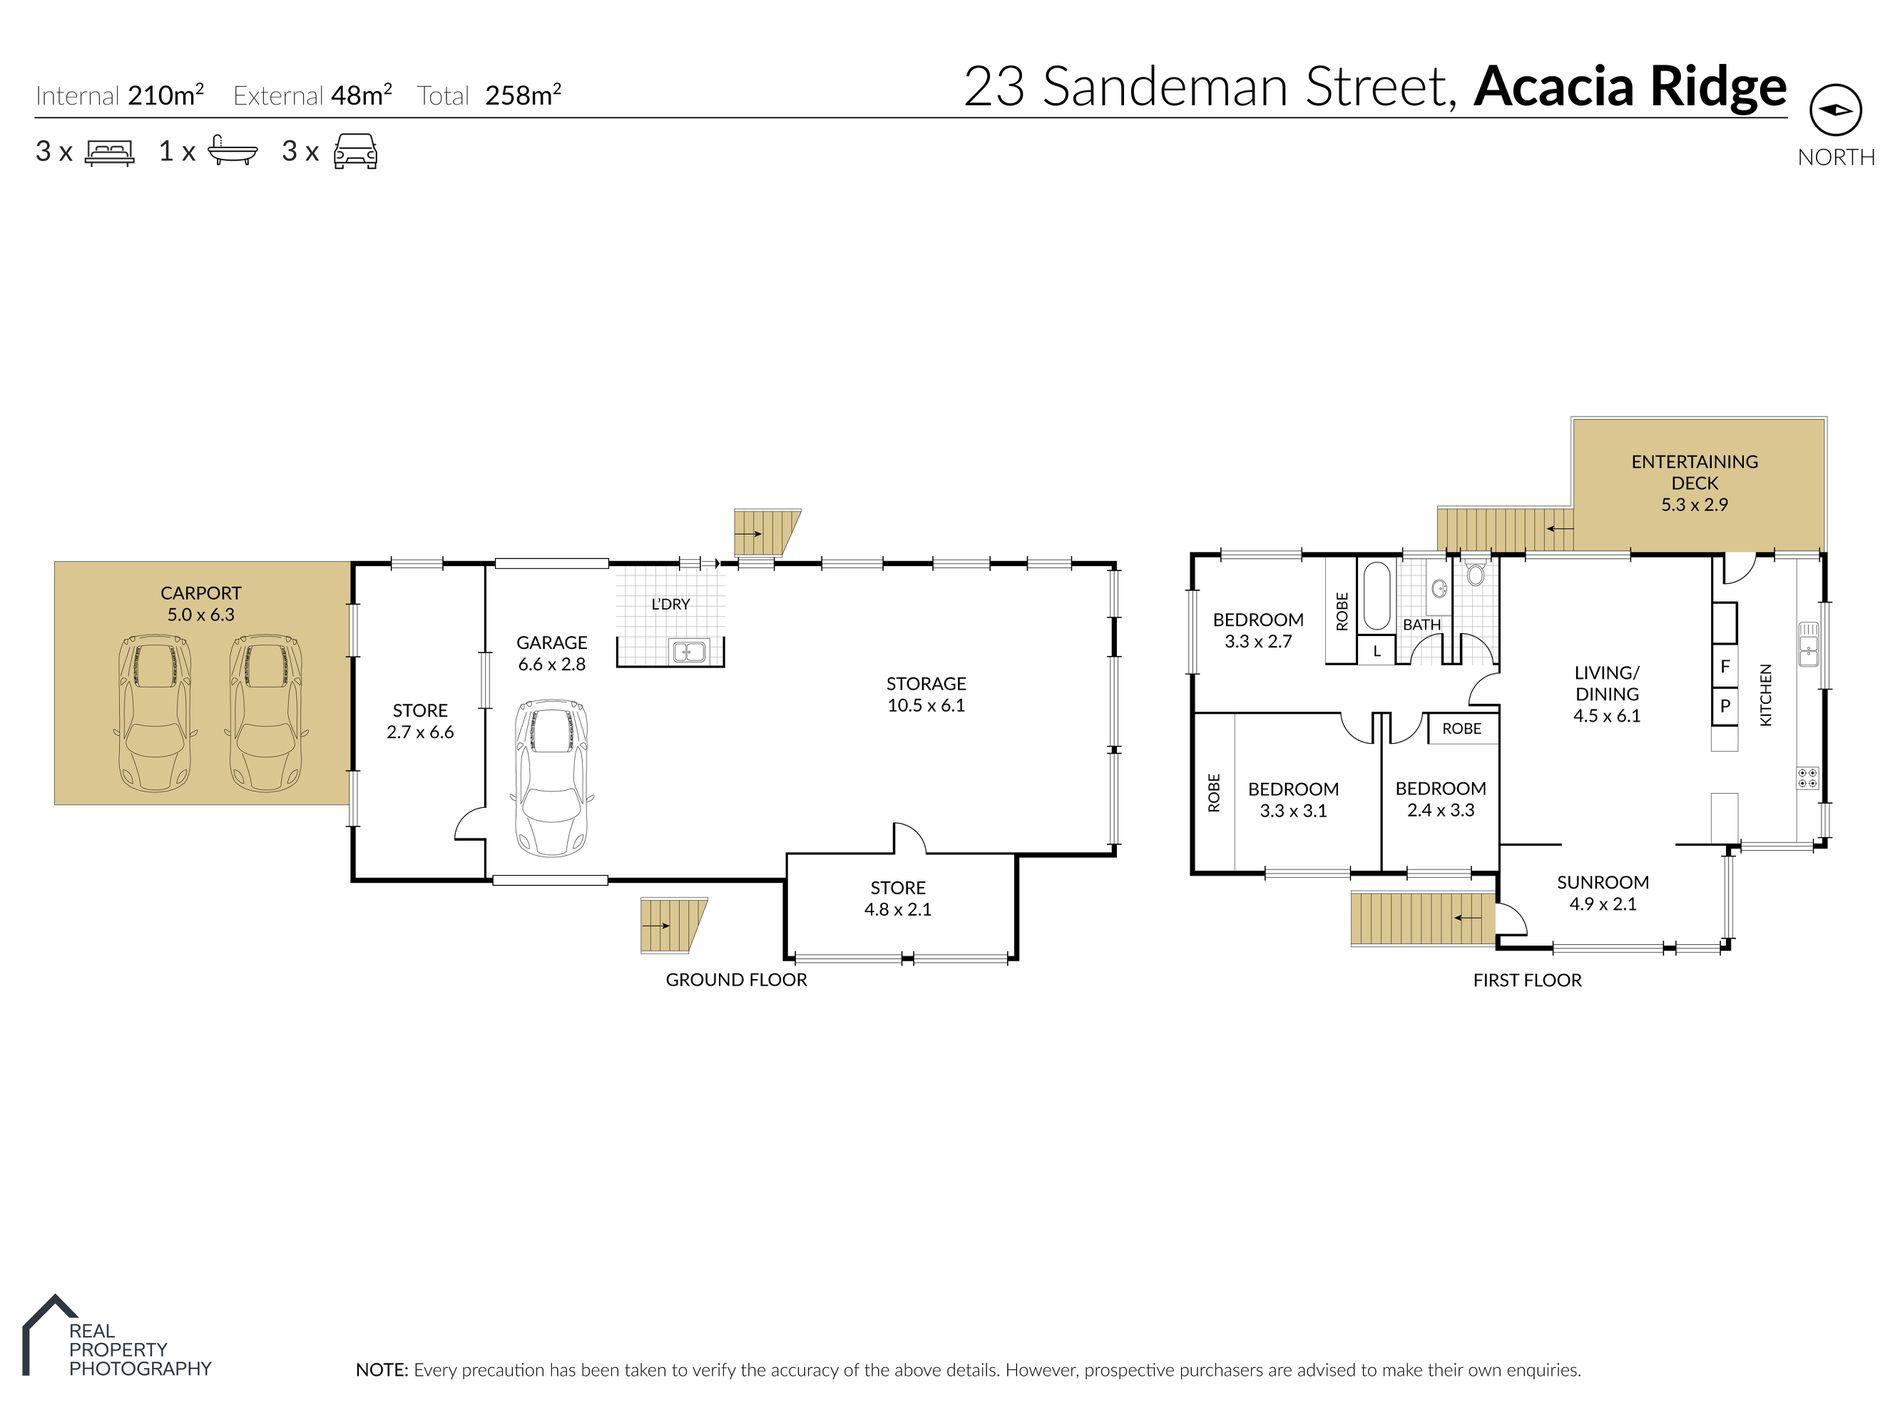 23 Sandeman Street, Acacia Ridge